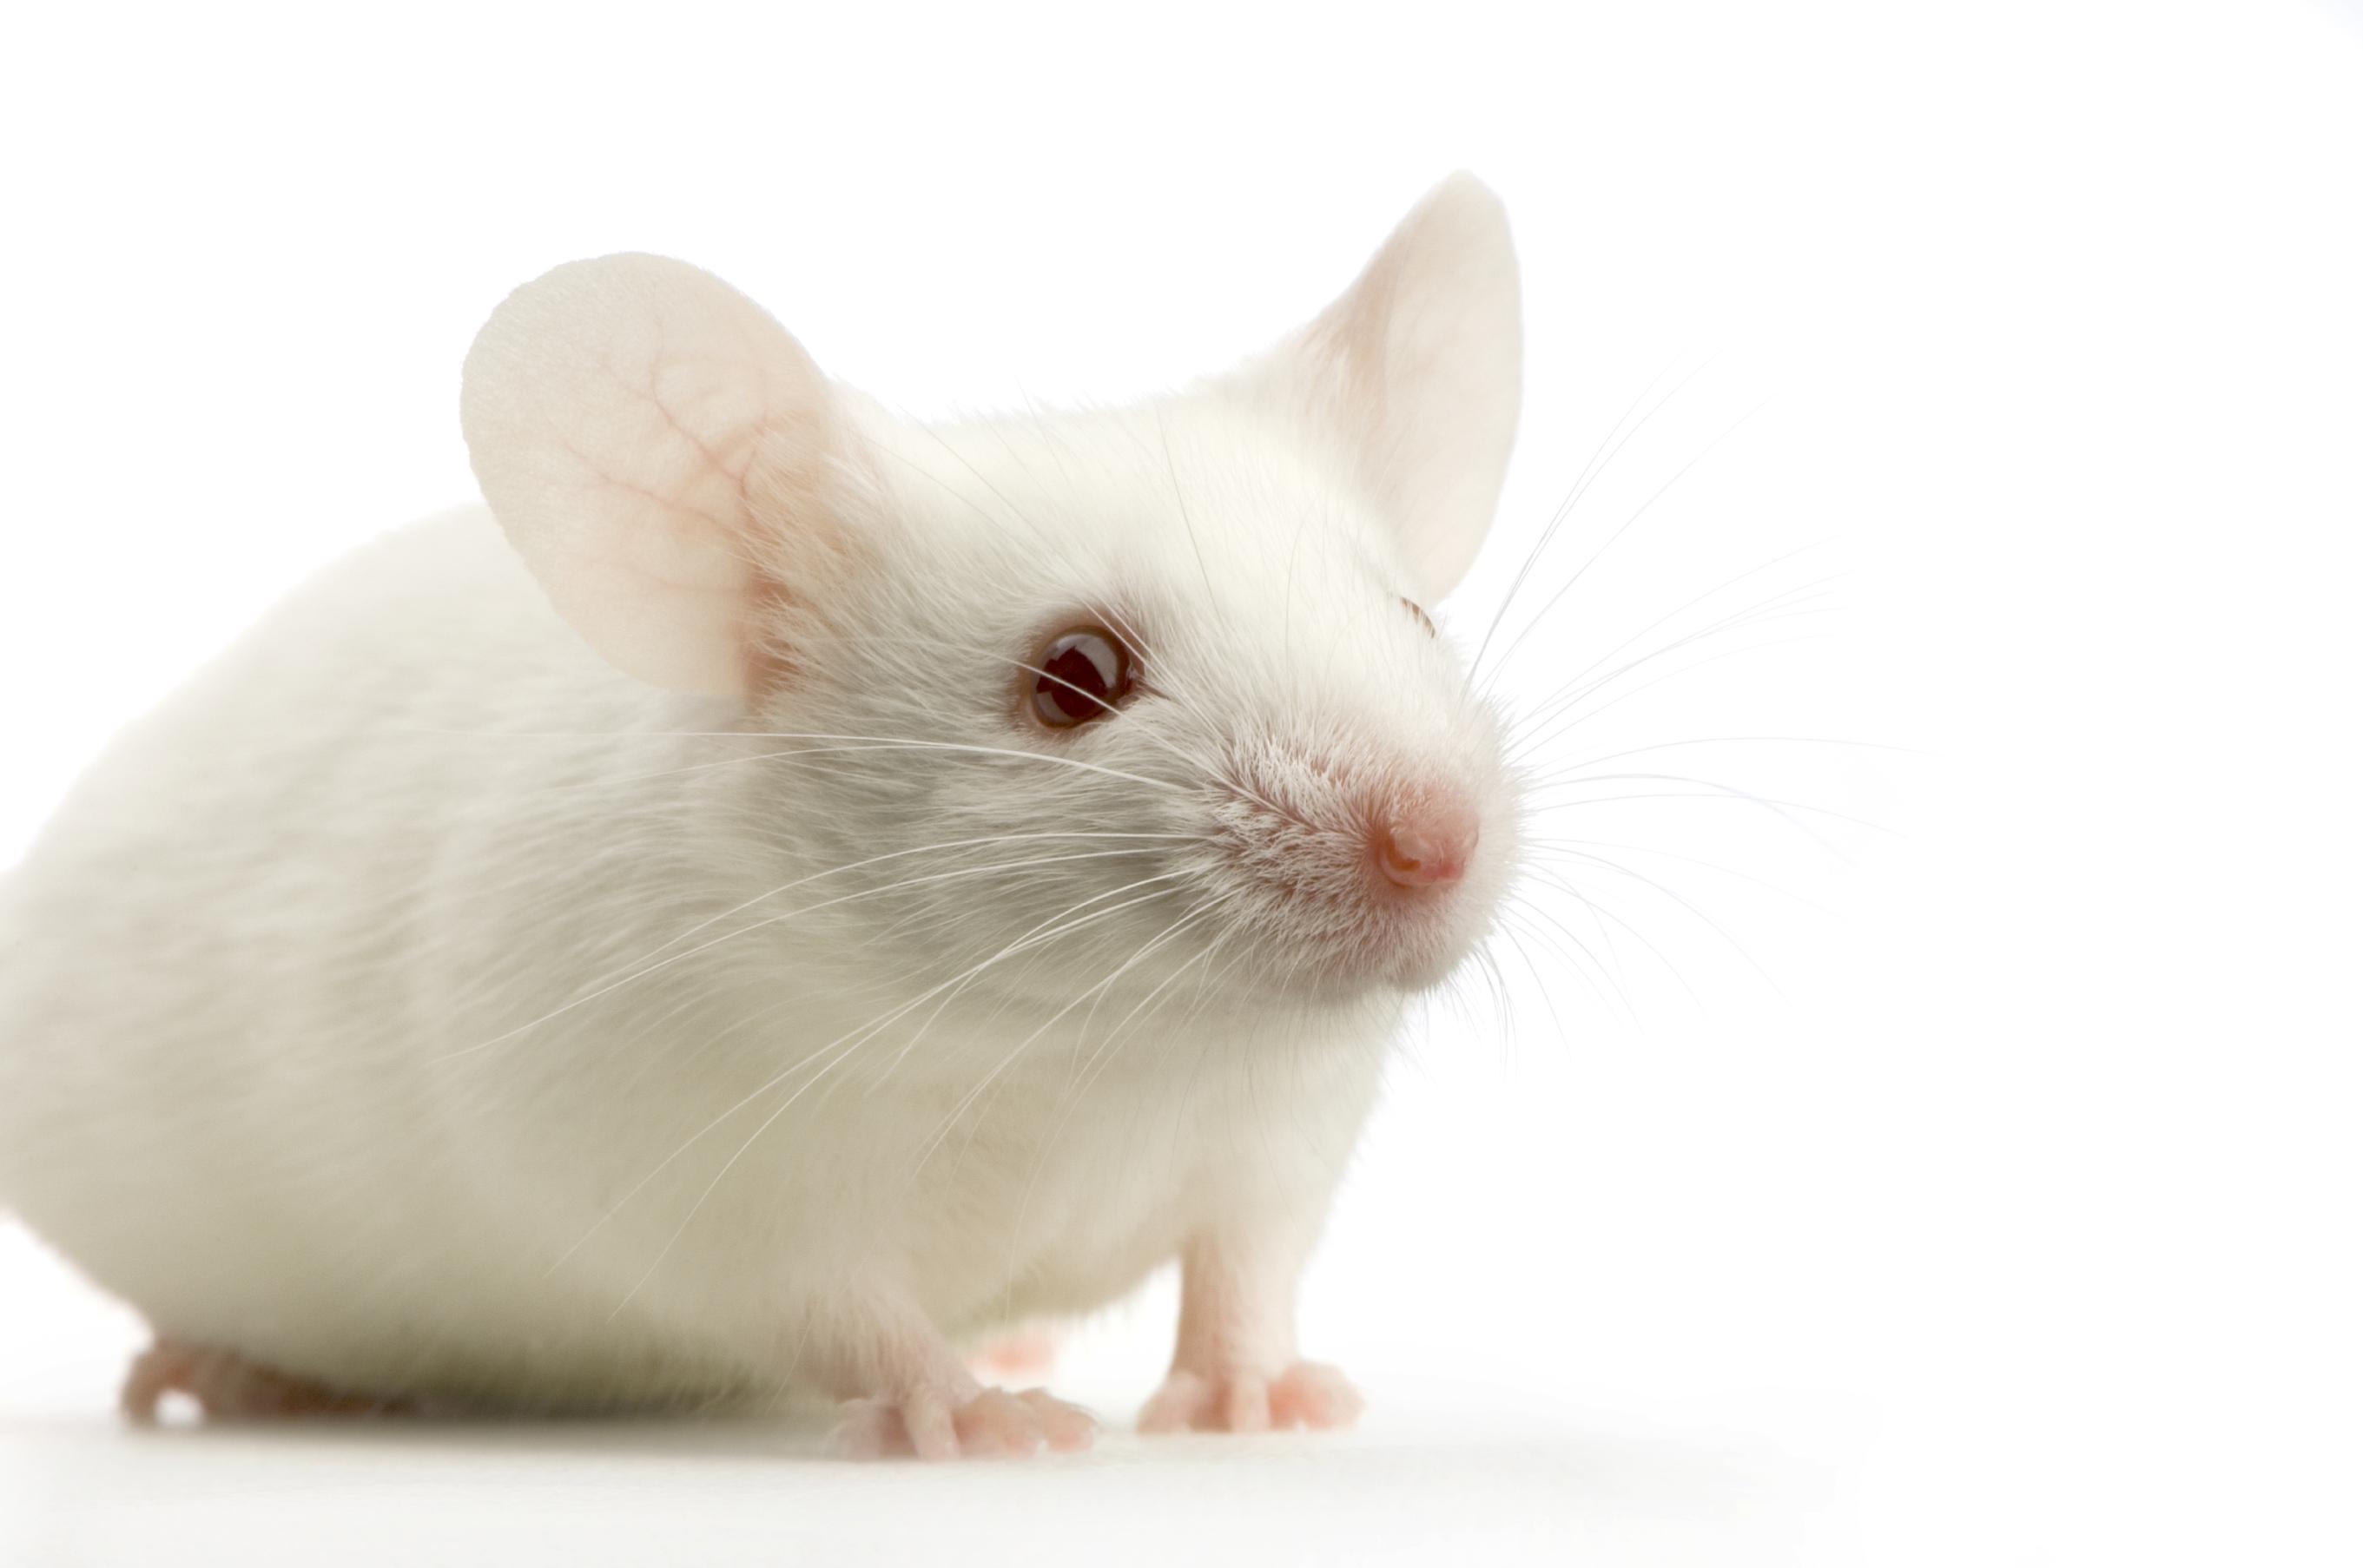 mouse_close_up_big_ears.jpg